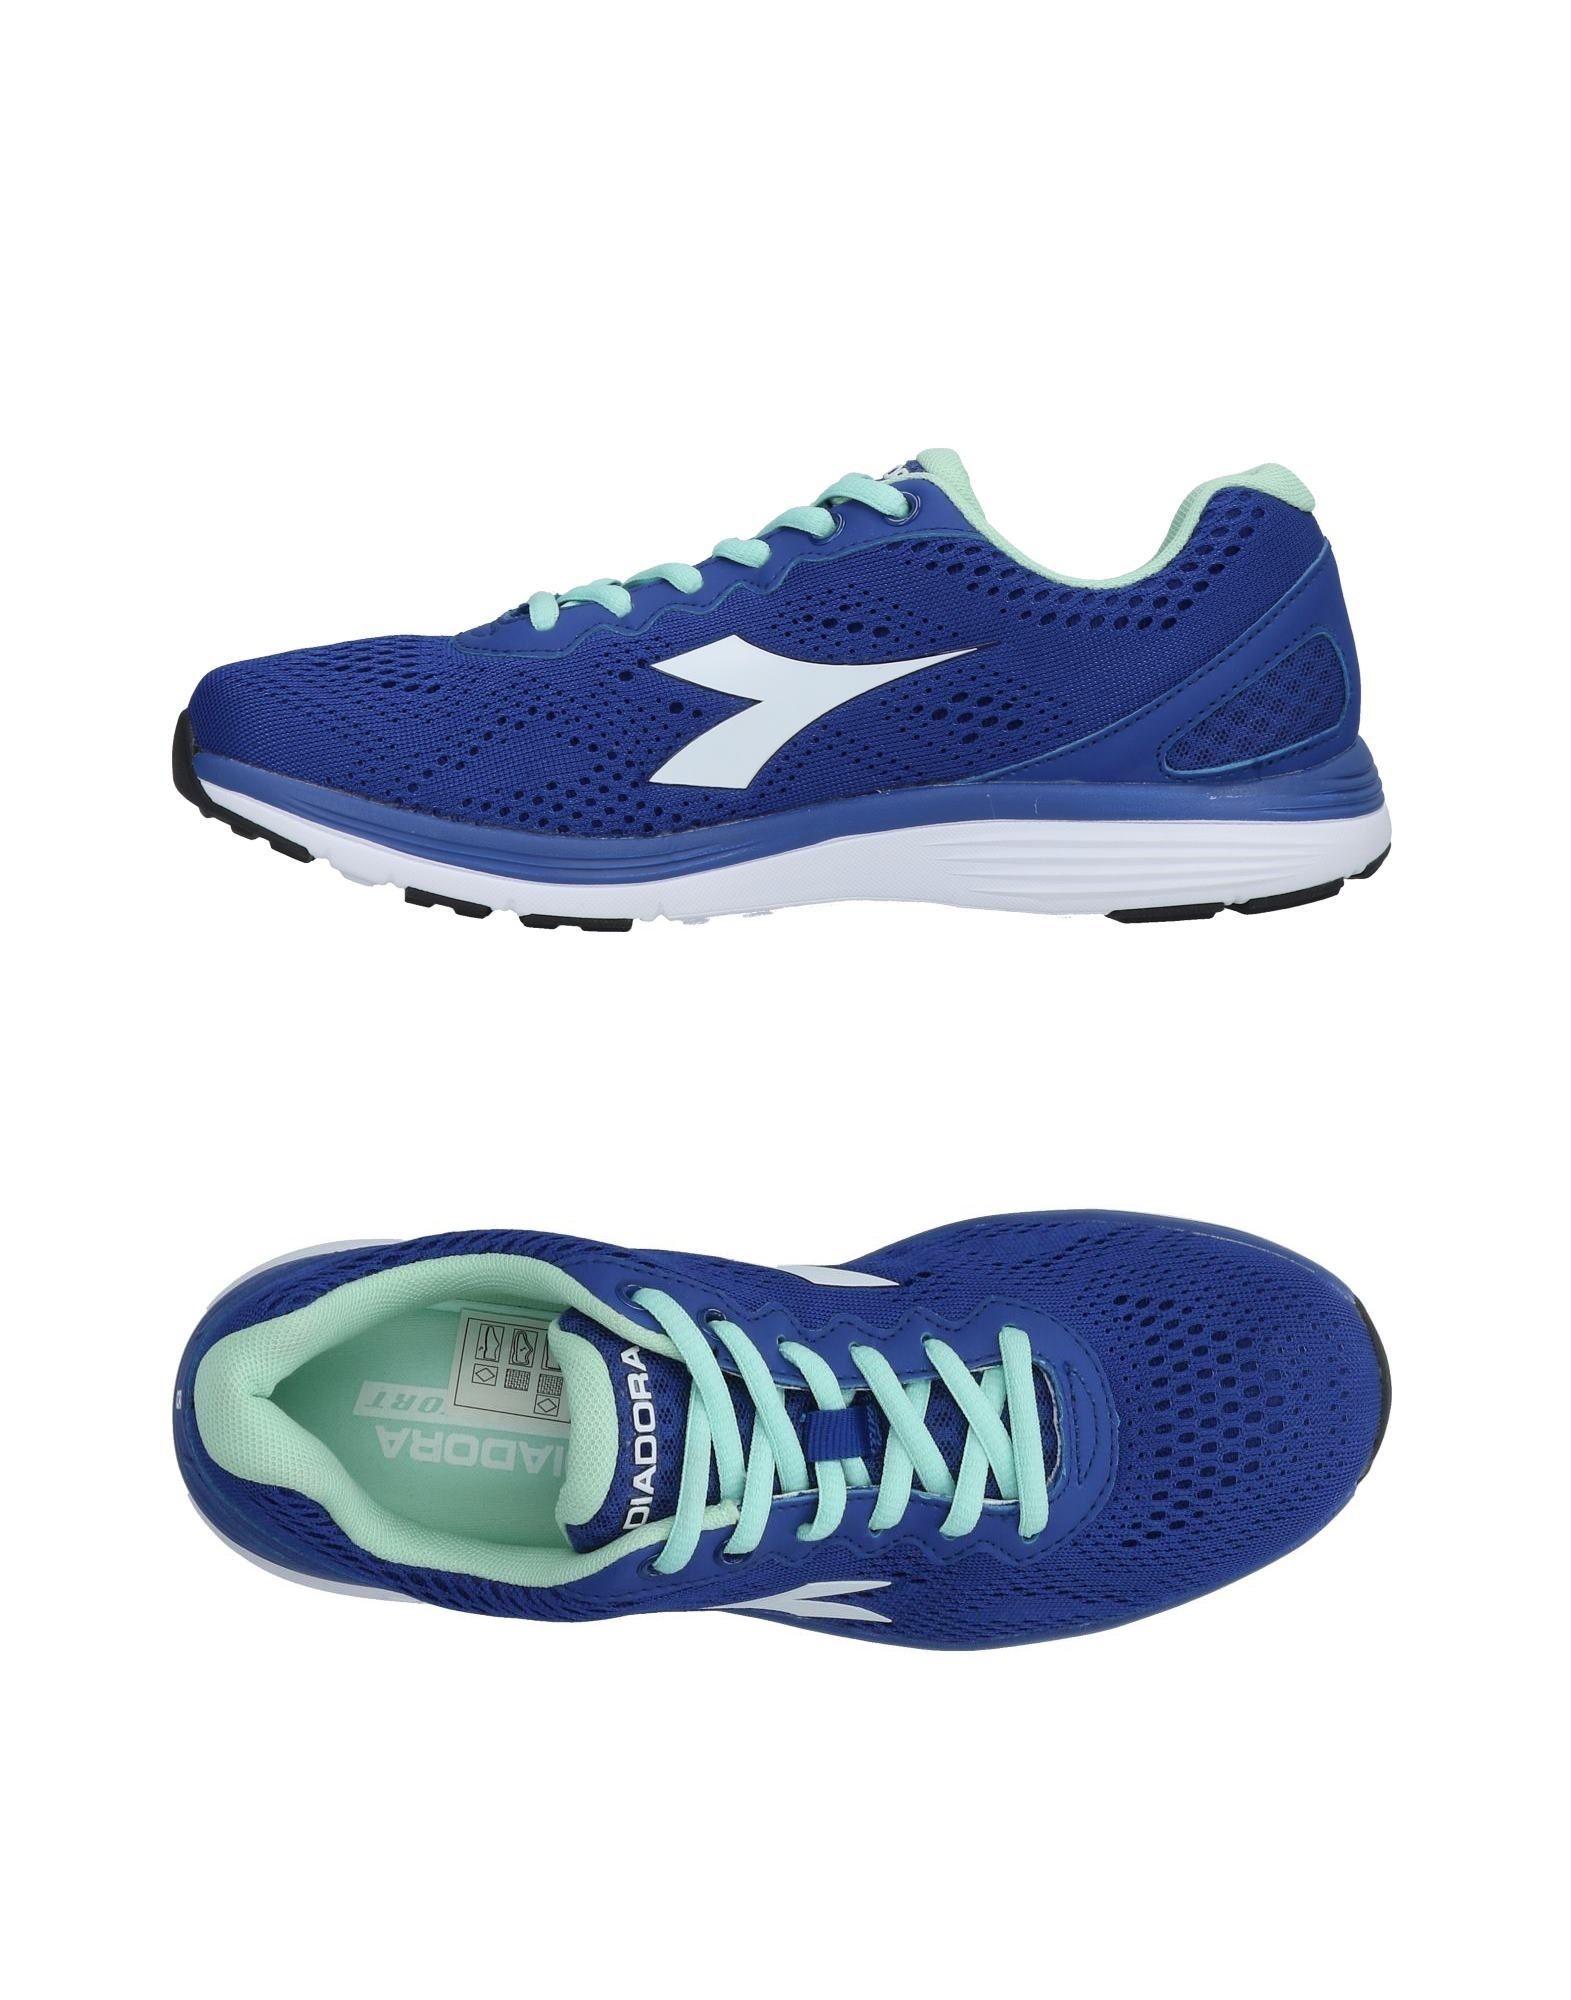 Diadora Sneakers Damen Damen Damen  11483720AL Gute Qualität beliebte Schuhe 3e7fe7